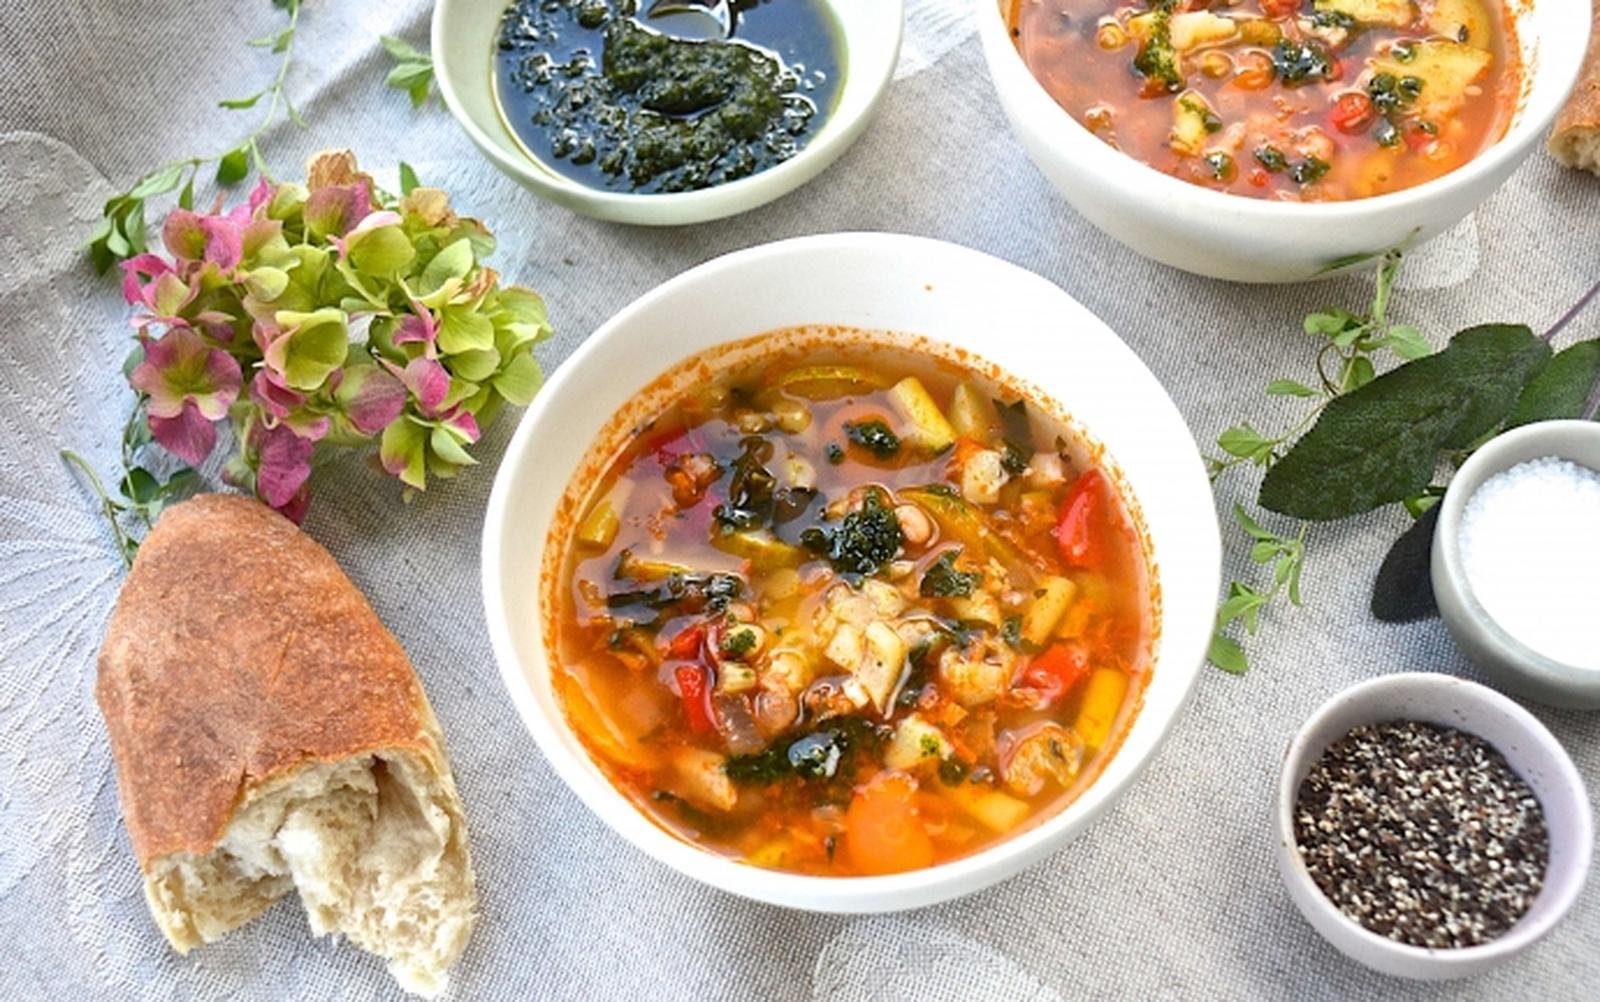 Autumn Vegetable Soup With Parsley Pesto [Vegan, Gluten-Free]